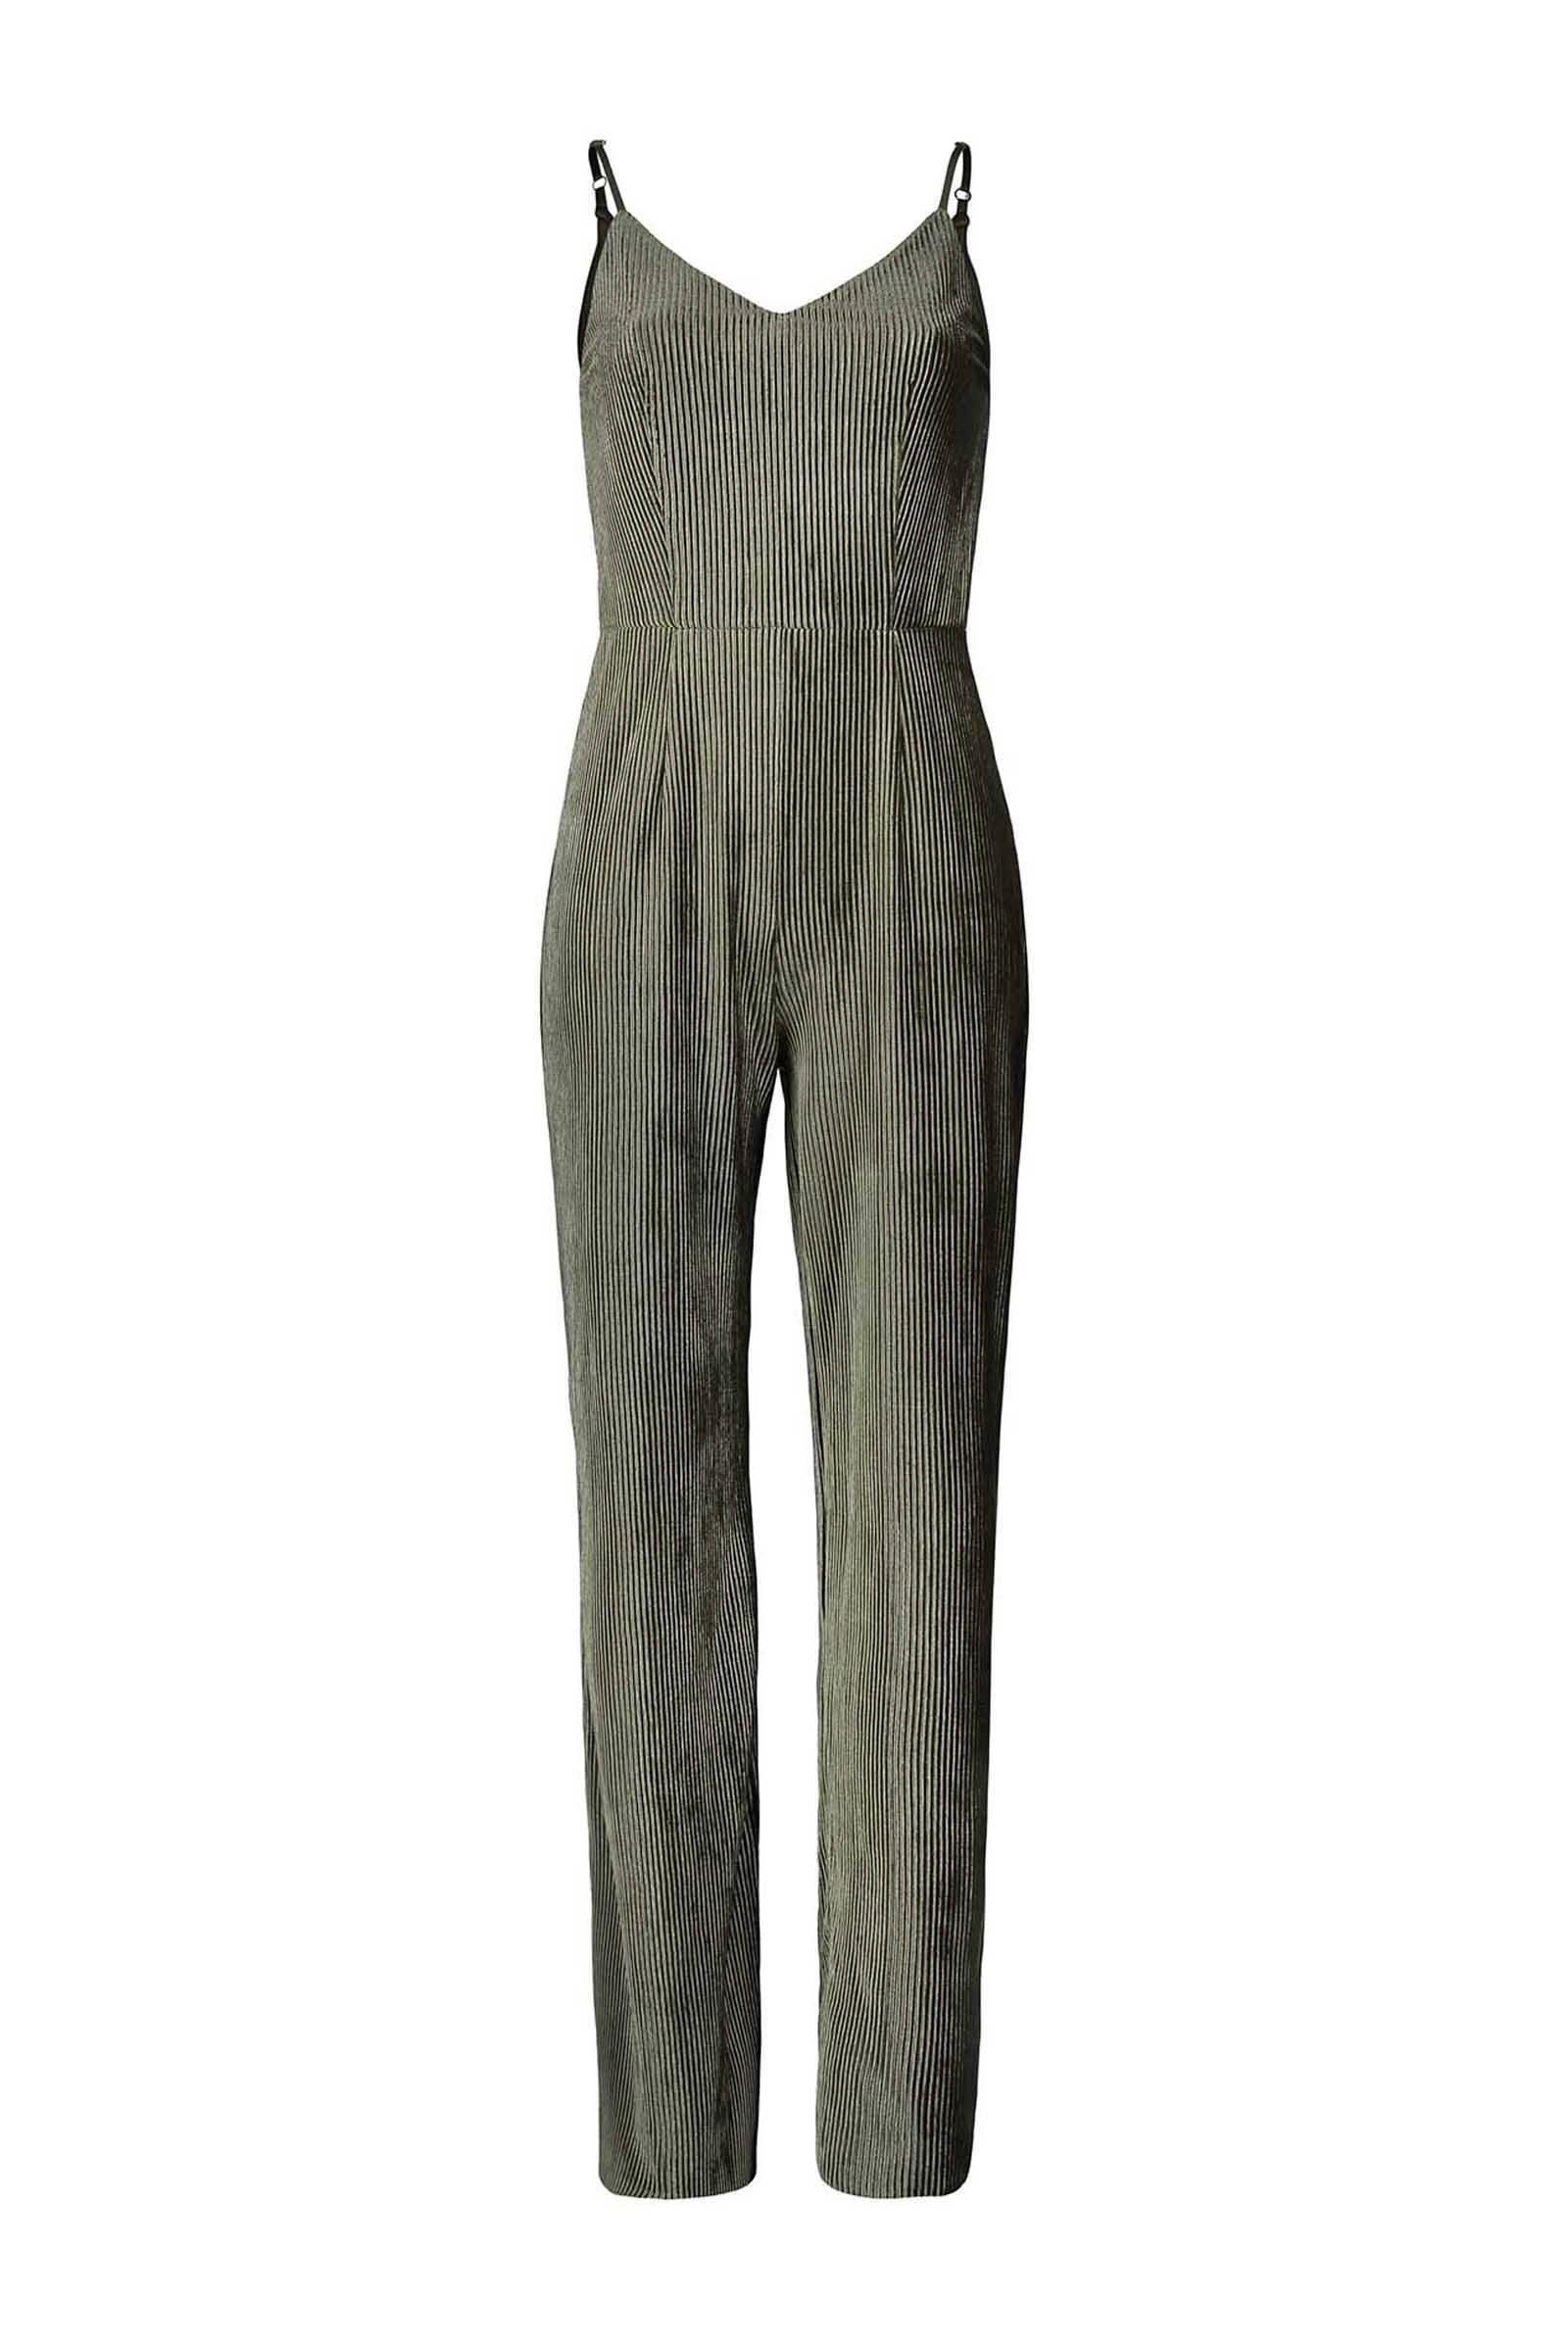 Sissy-Boy Fluwelen plissé jumpsuit olijfgroen (dames)